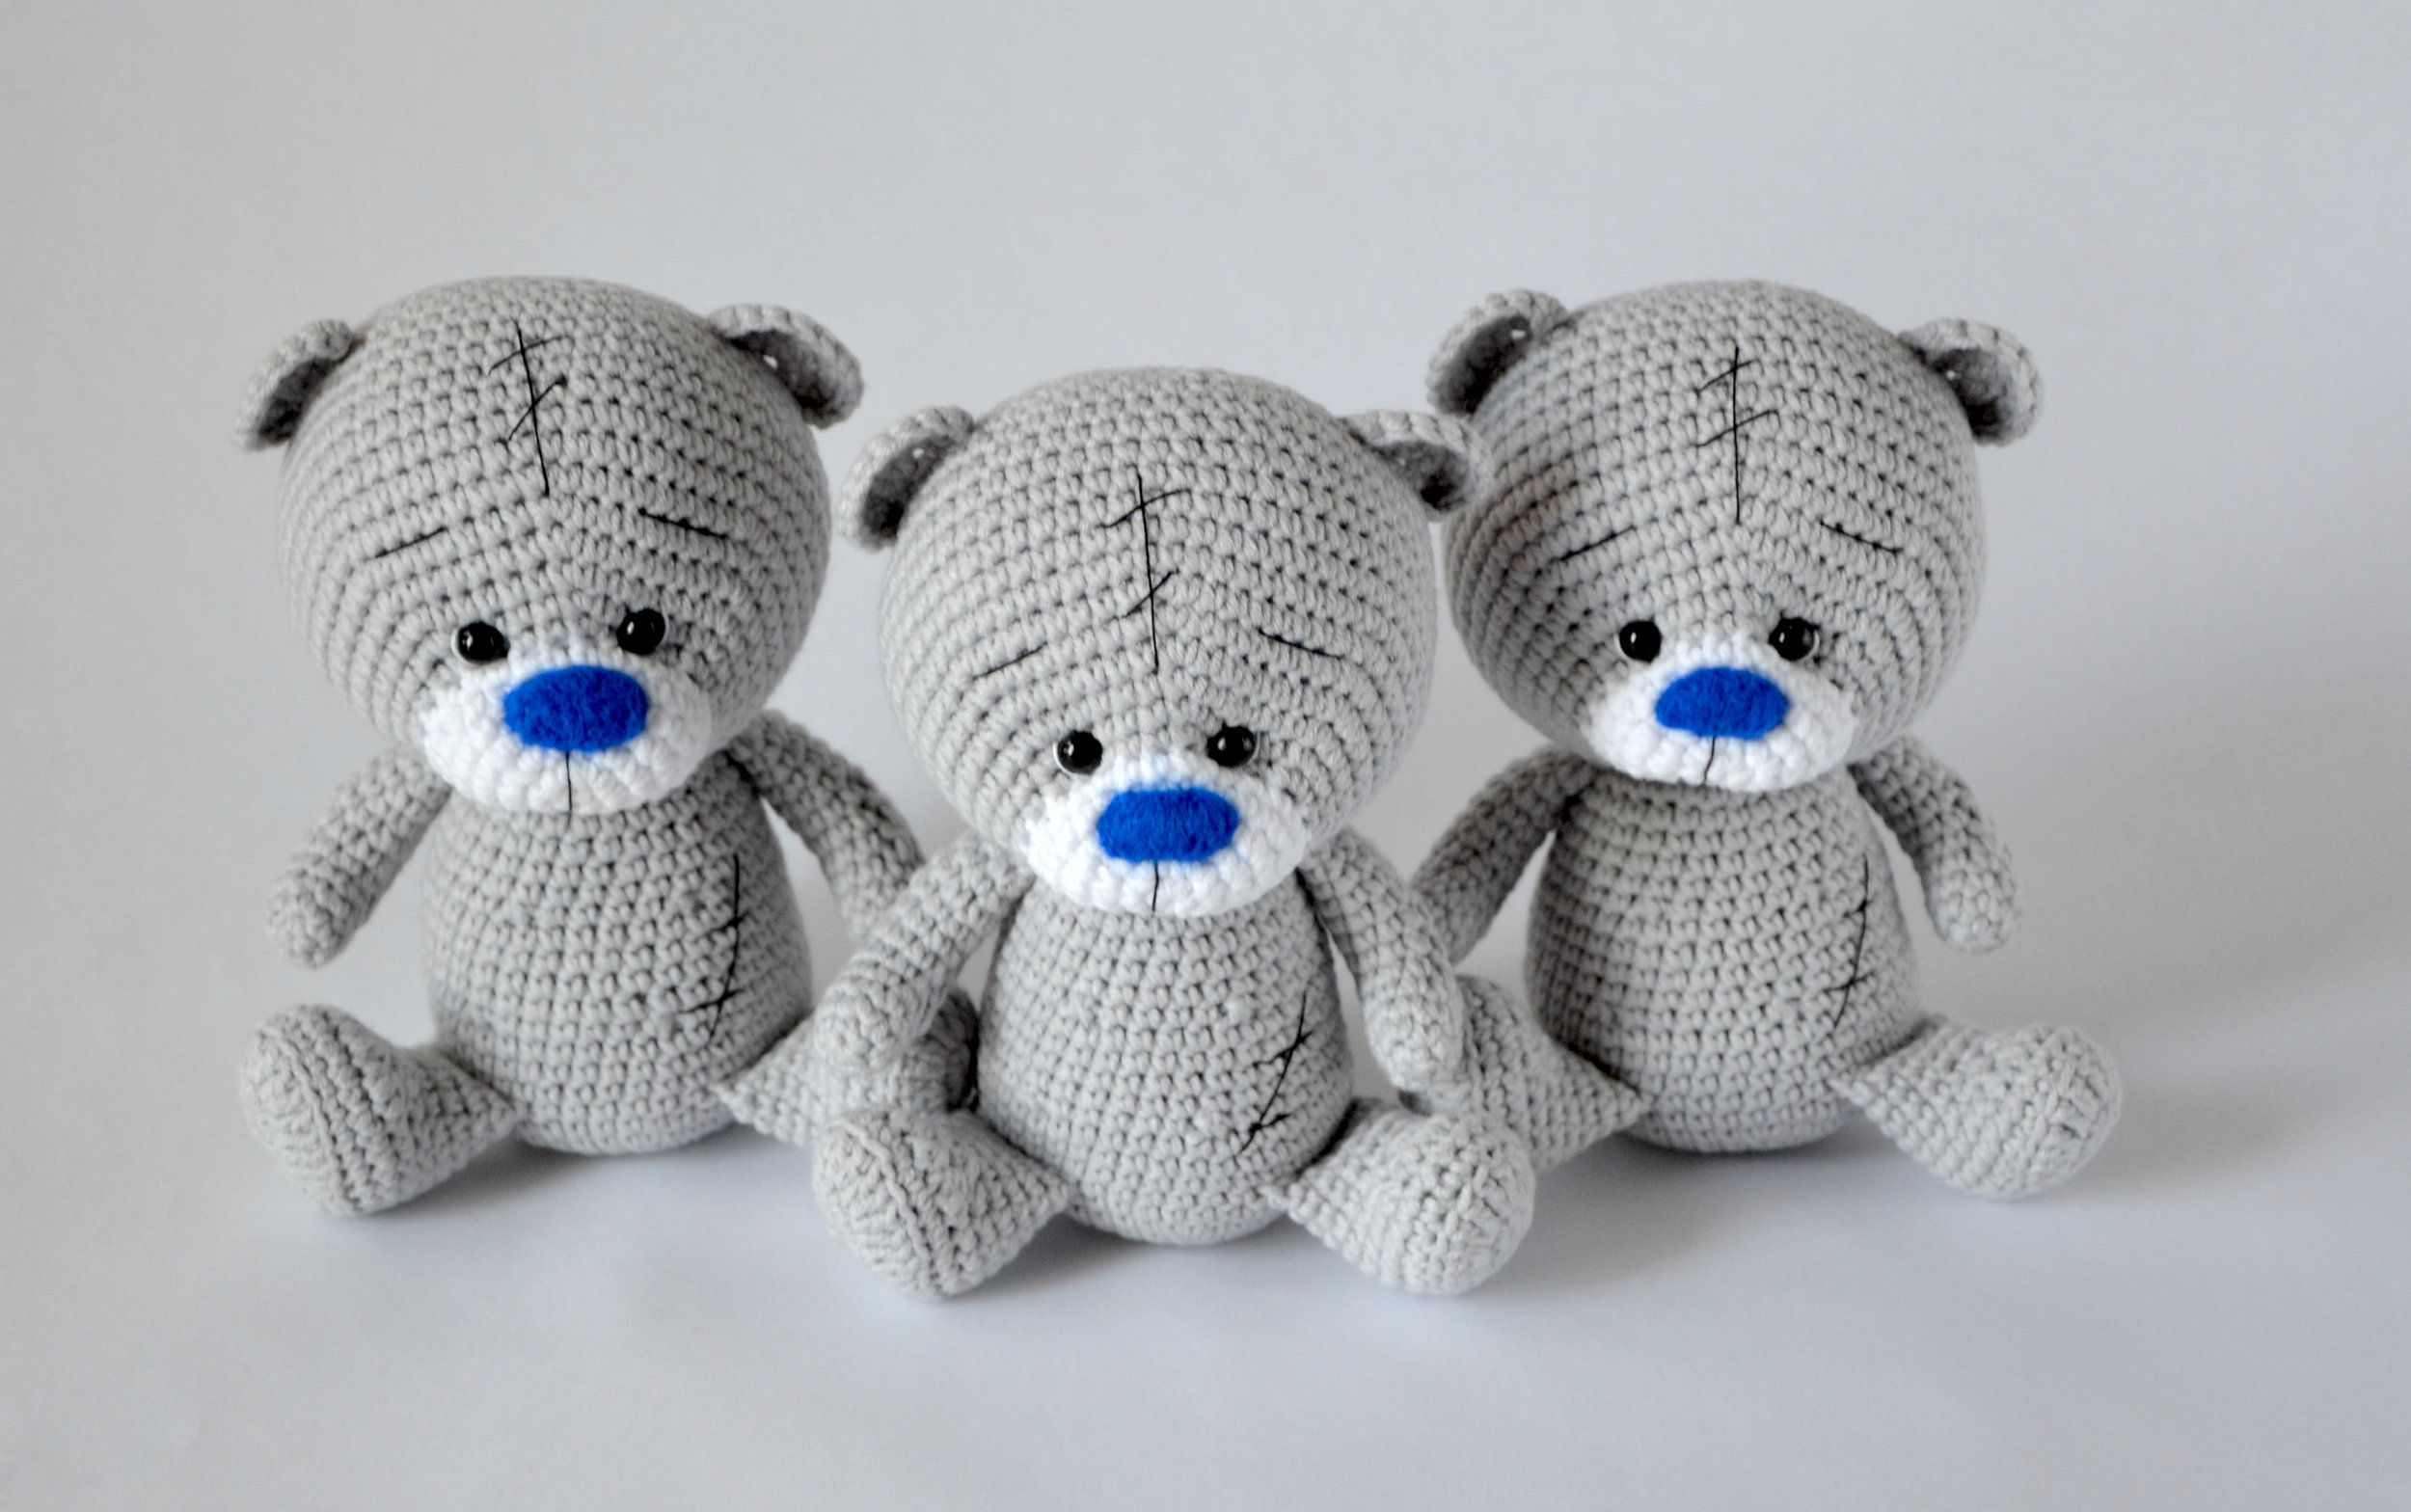 Crochet bear Plush bear Amigurumi animals Organic teddy bear Baby gifts Stuffed teddy Knitted plush toy Soft plush bears Gift for kids #bearplushtoy